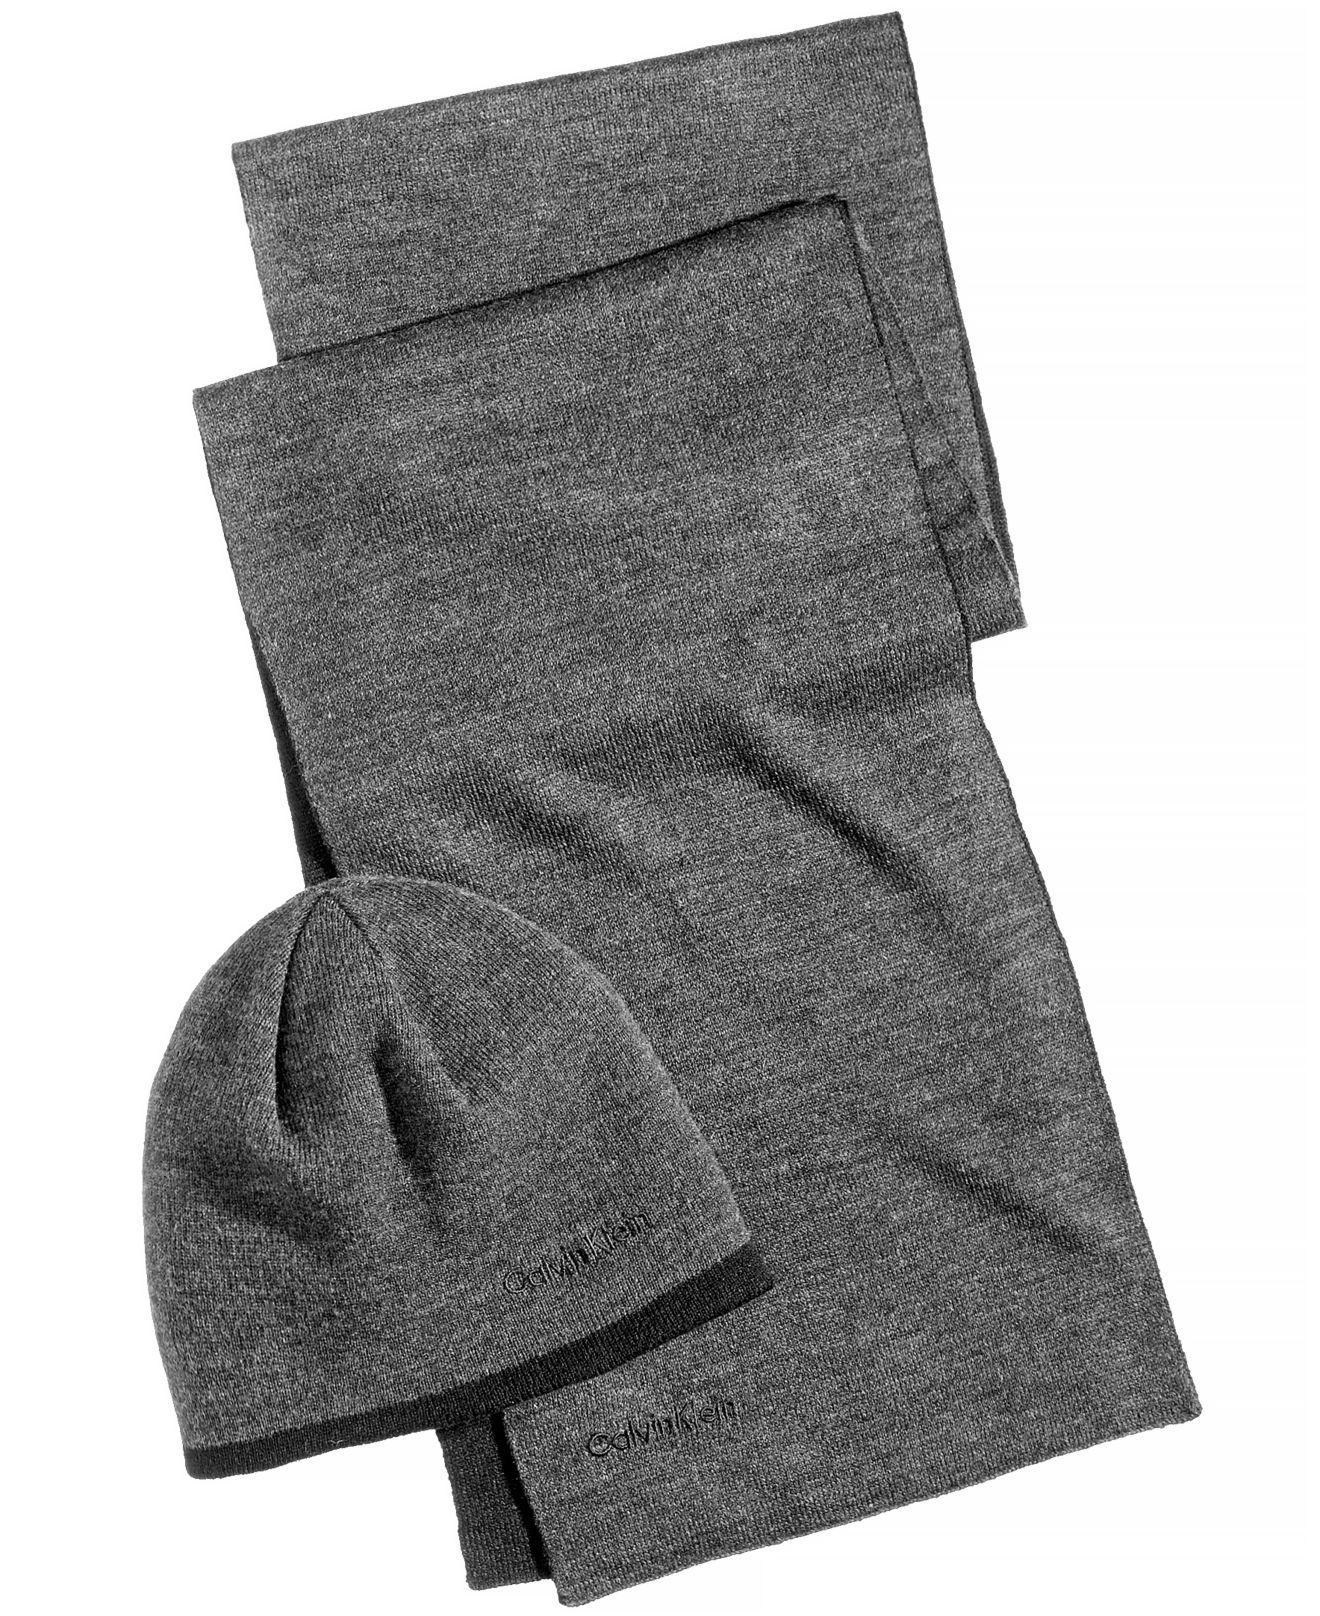 Lyst - Calvin Klein Men s Reversible Hat   Scarf Set in Black for Men 569550f34d9